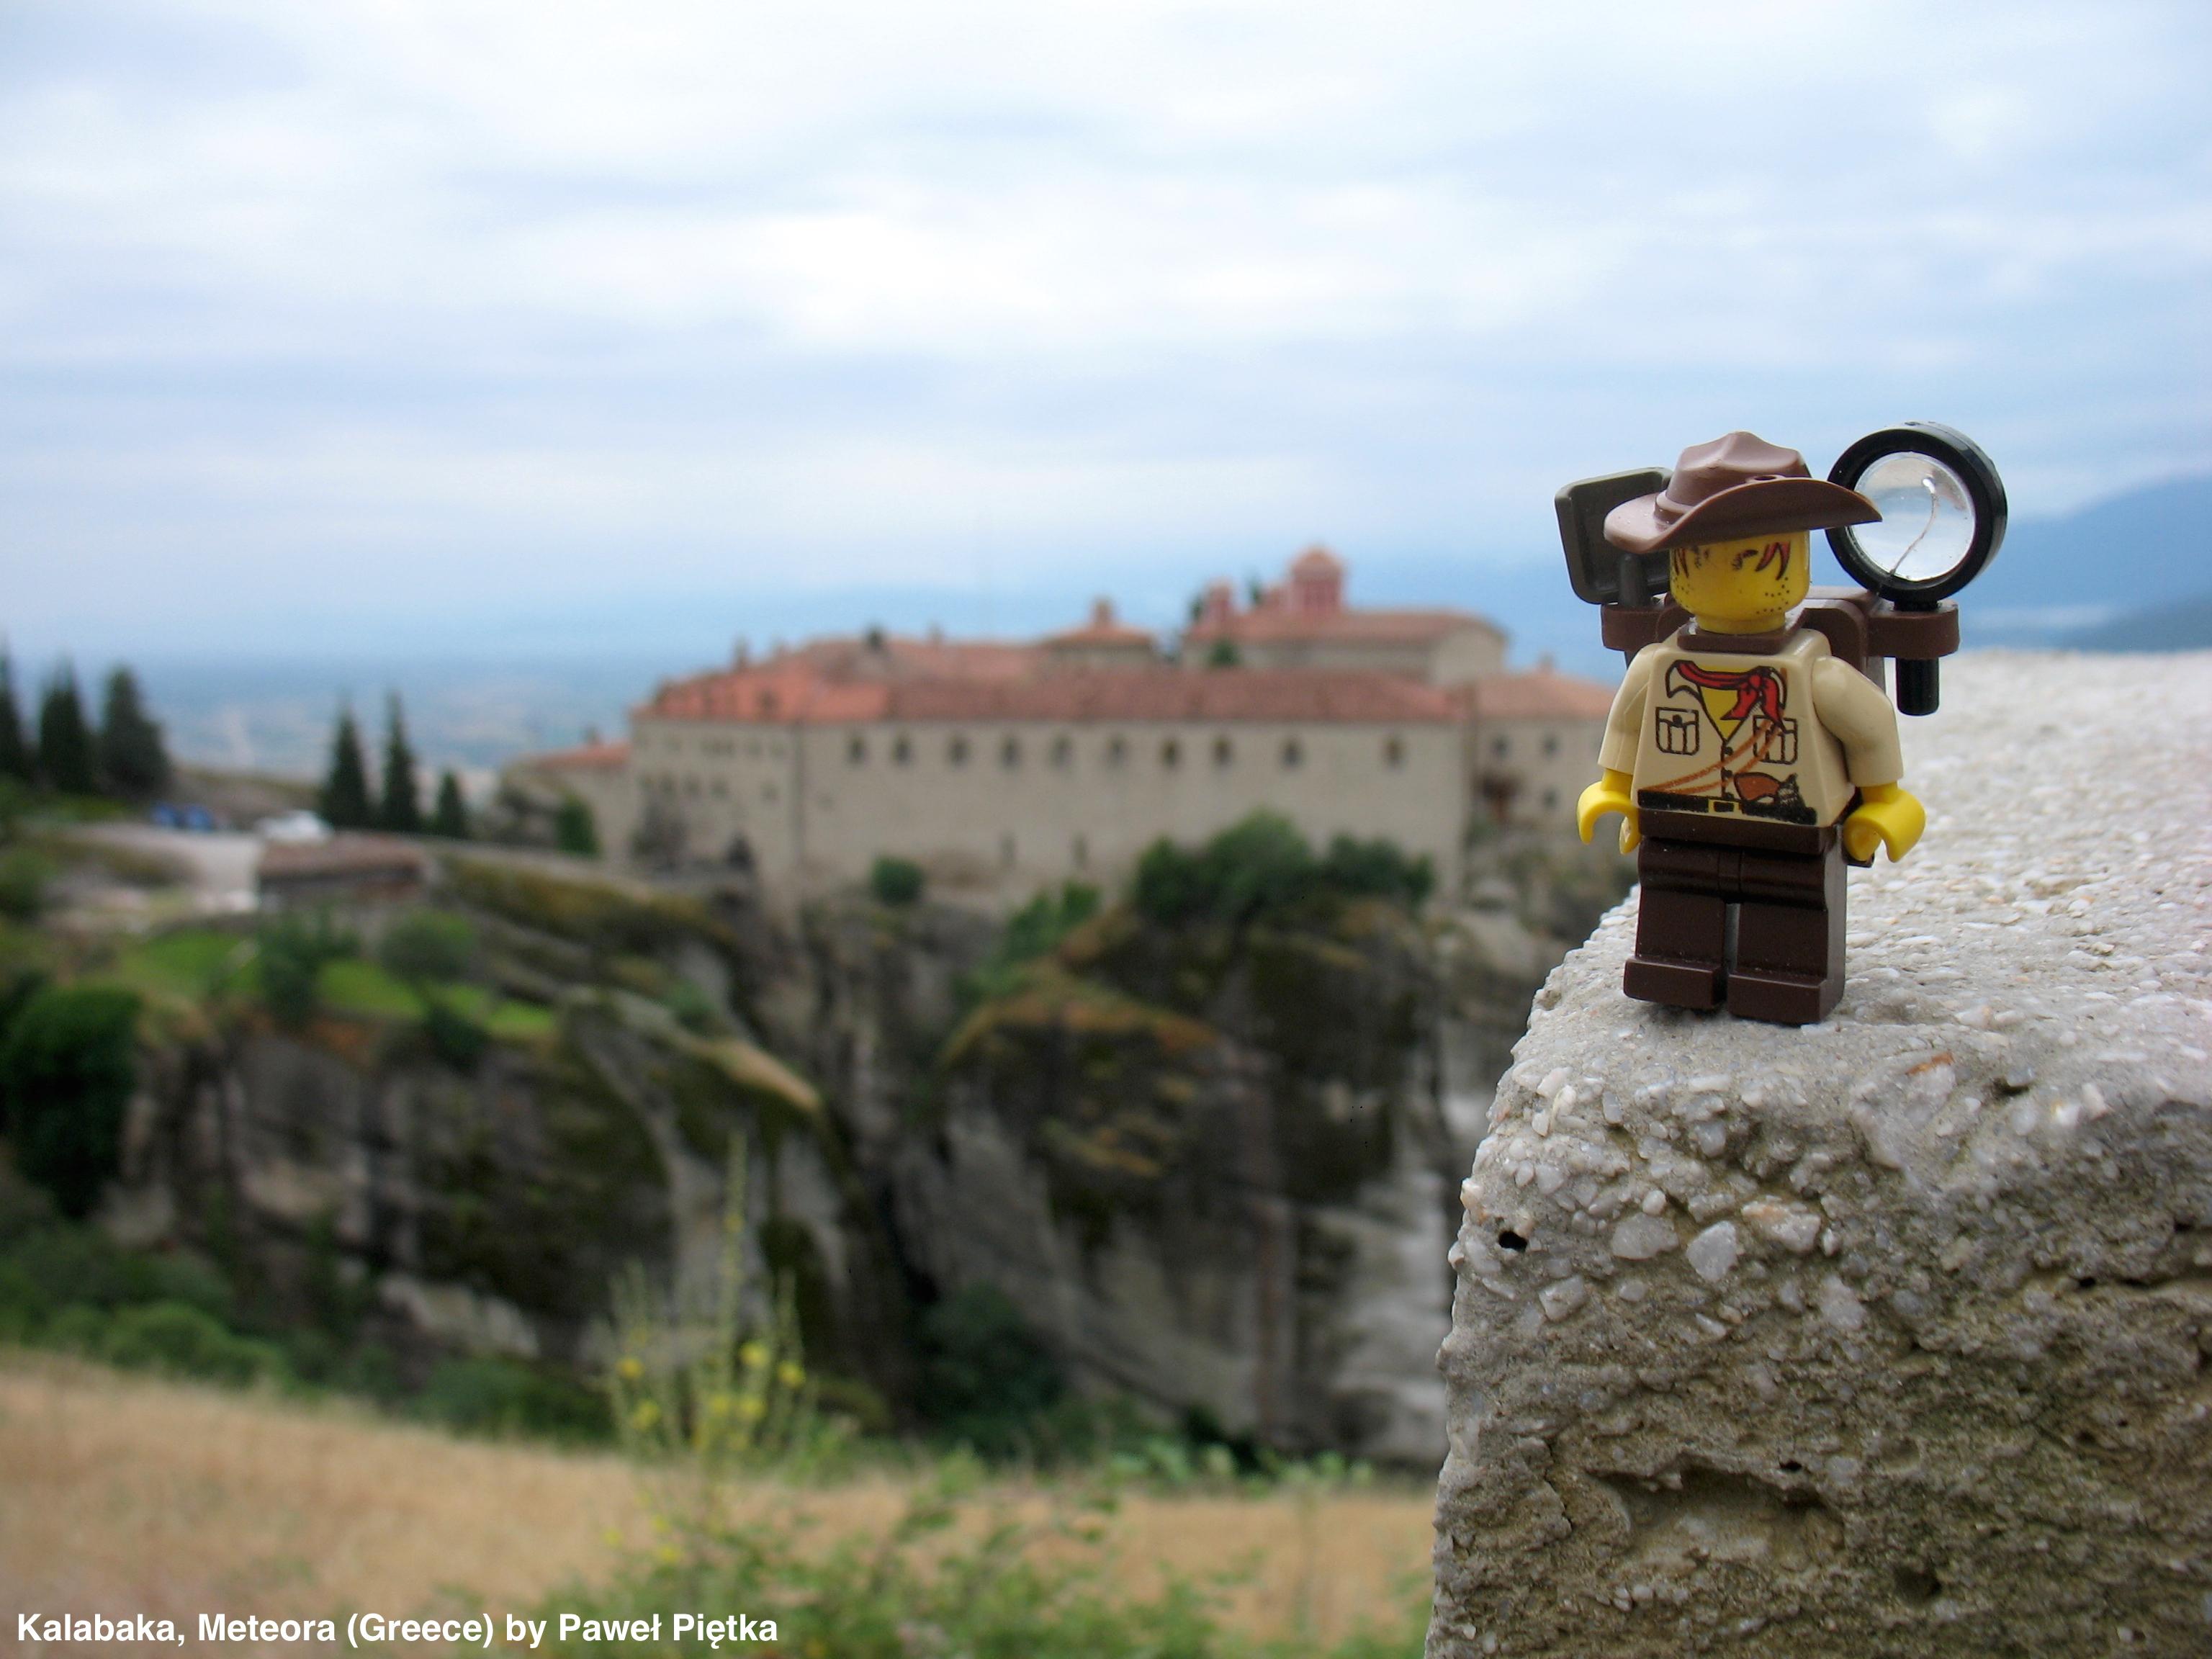 Kalabaka, Meteora (Greece) - Monastery of Saint Stephen